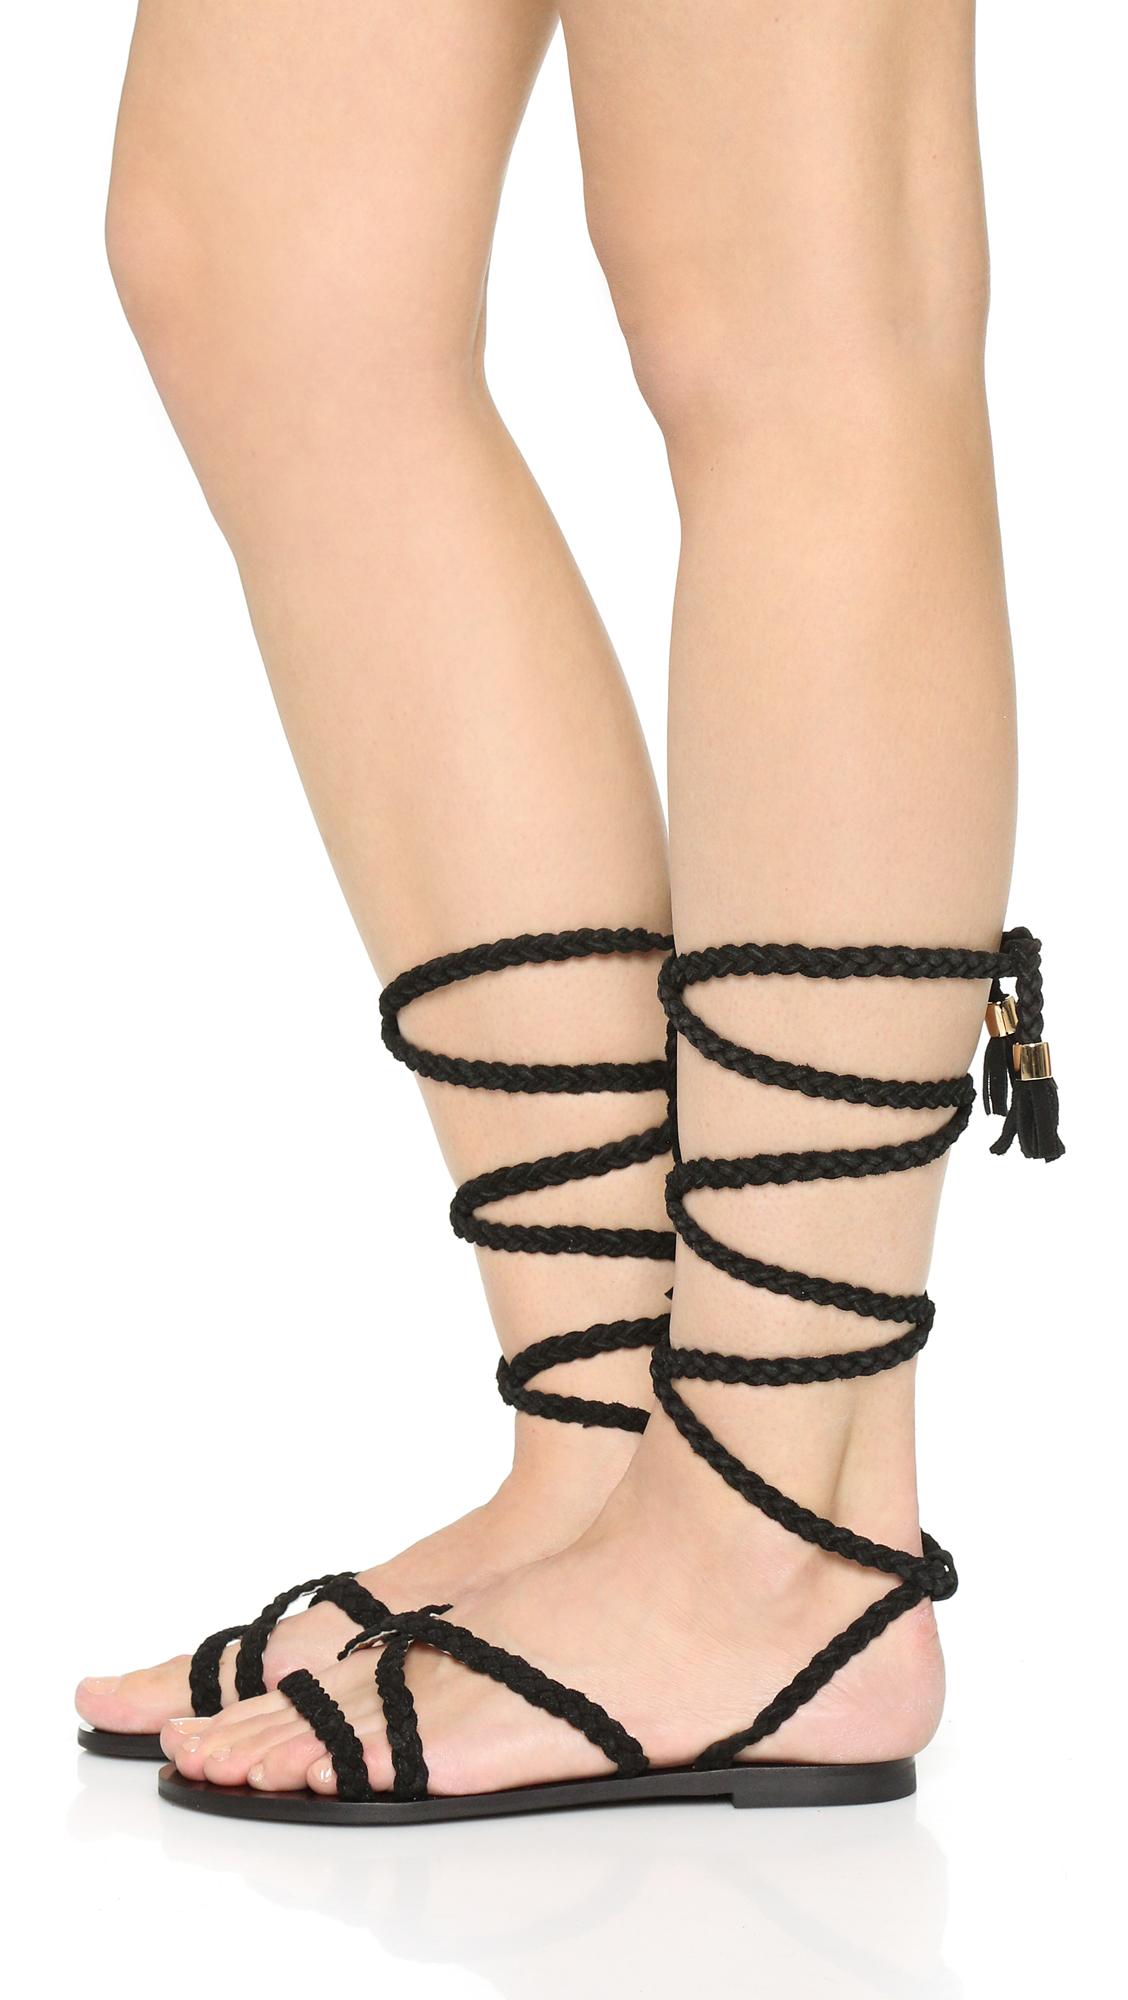 c72cd5bcb43a Raye Sadie Gladiator Sandals